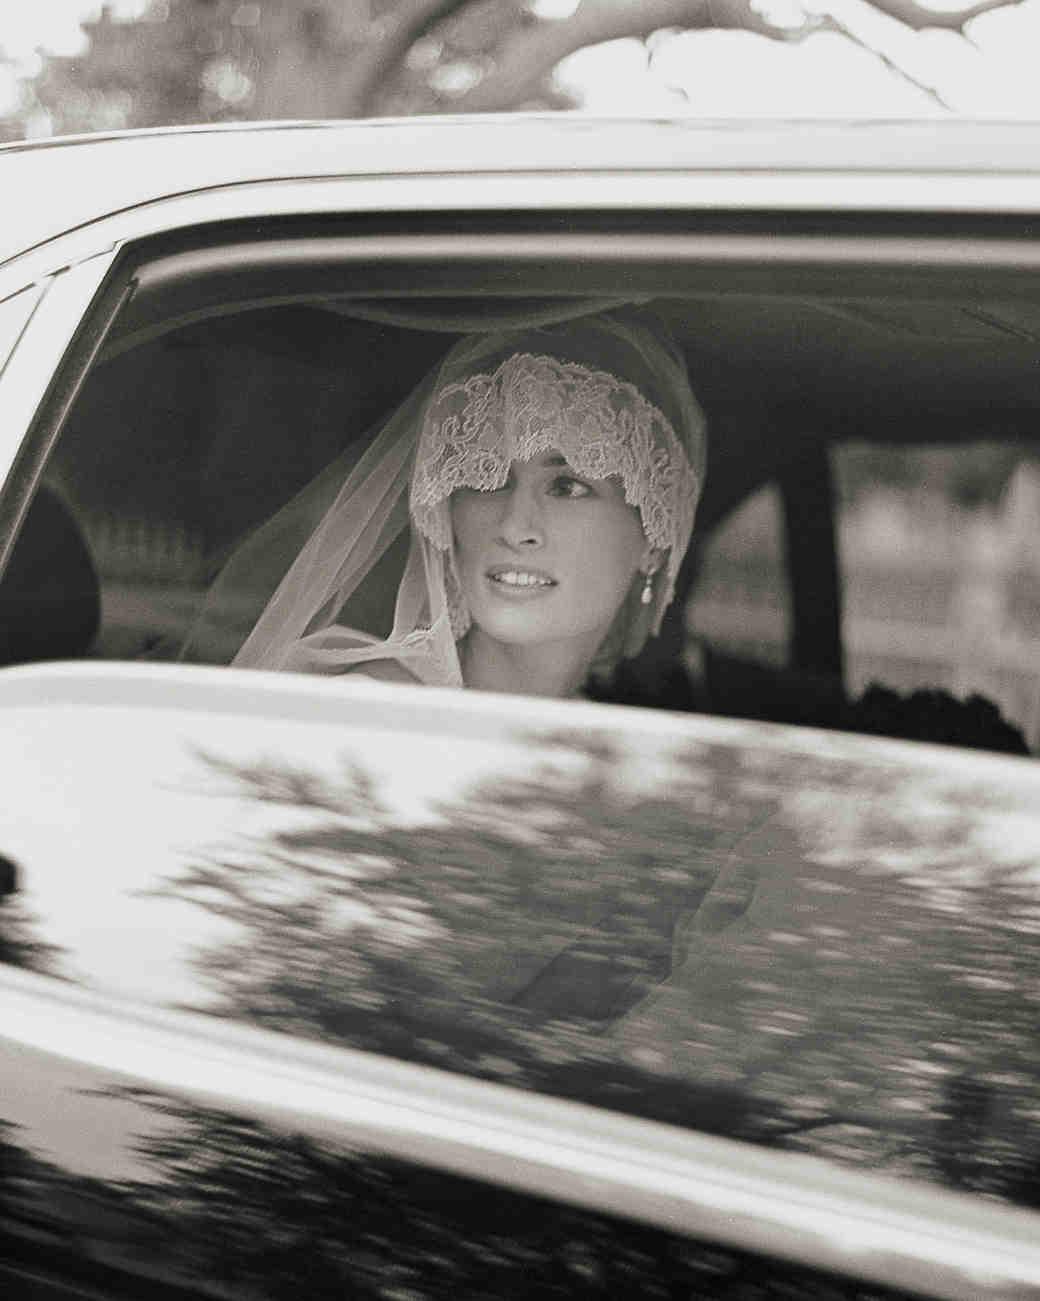 john-dolan-wedding-photographer-winter-1999-0914.jpg